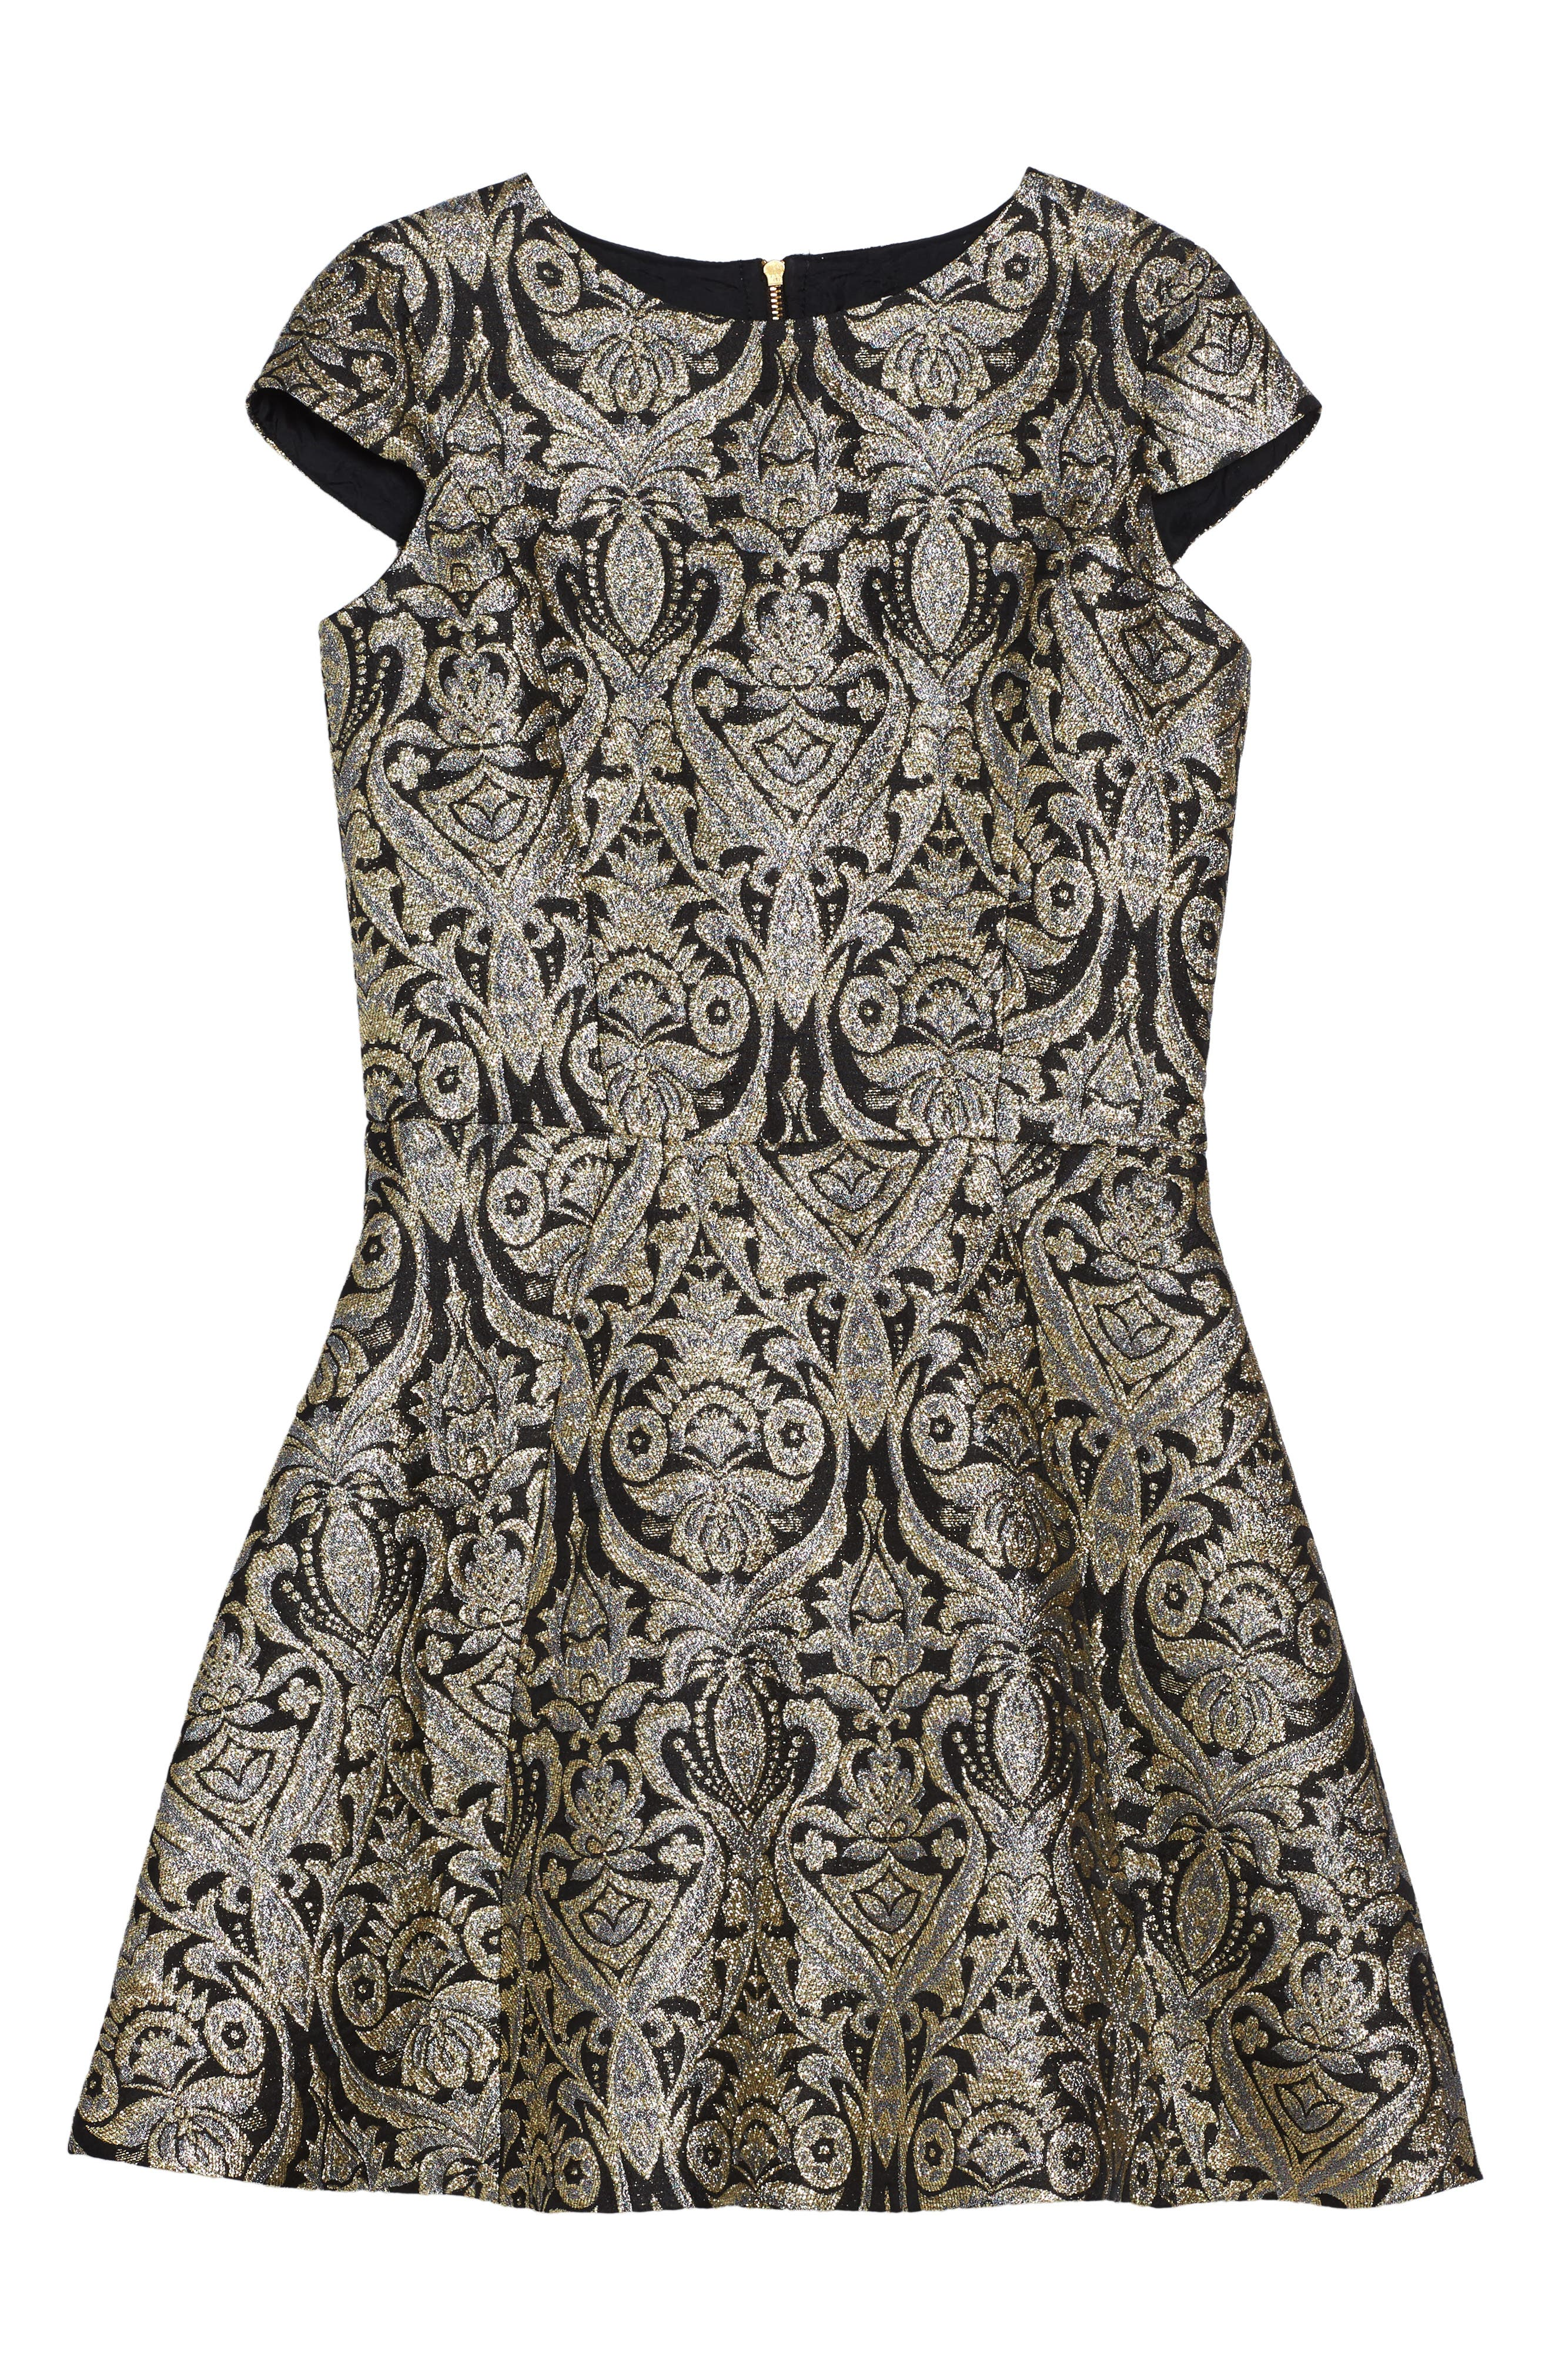 Main Image - David Charles Cap Sleeve Brocade Dress (Big Girls)